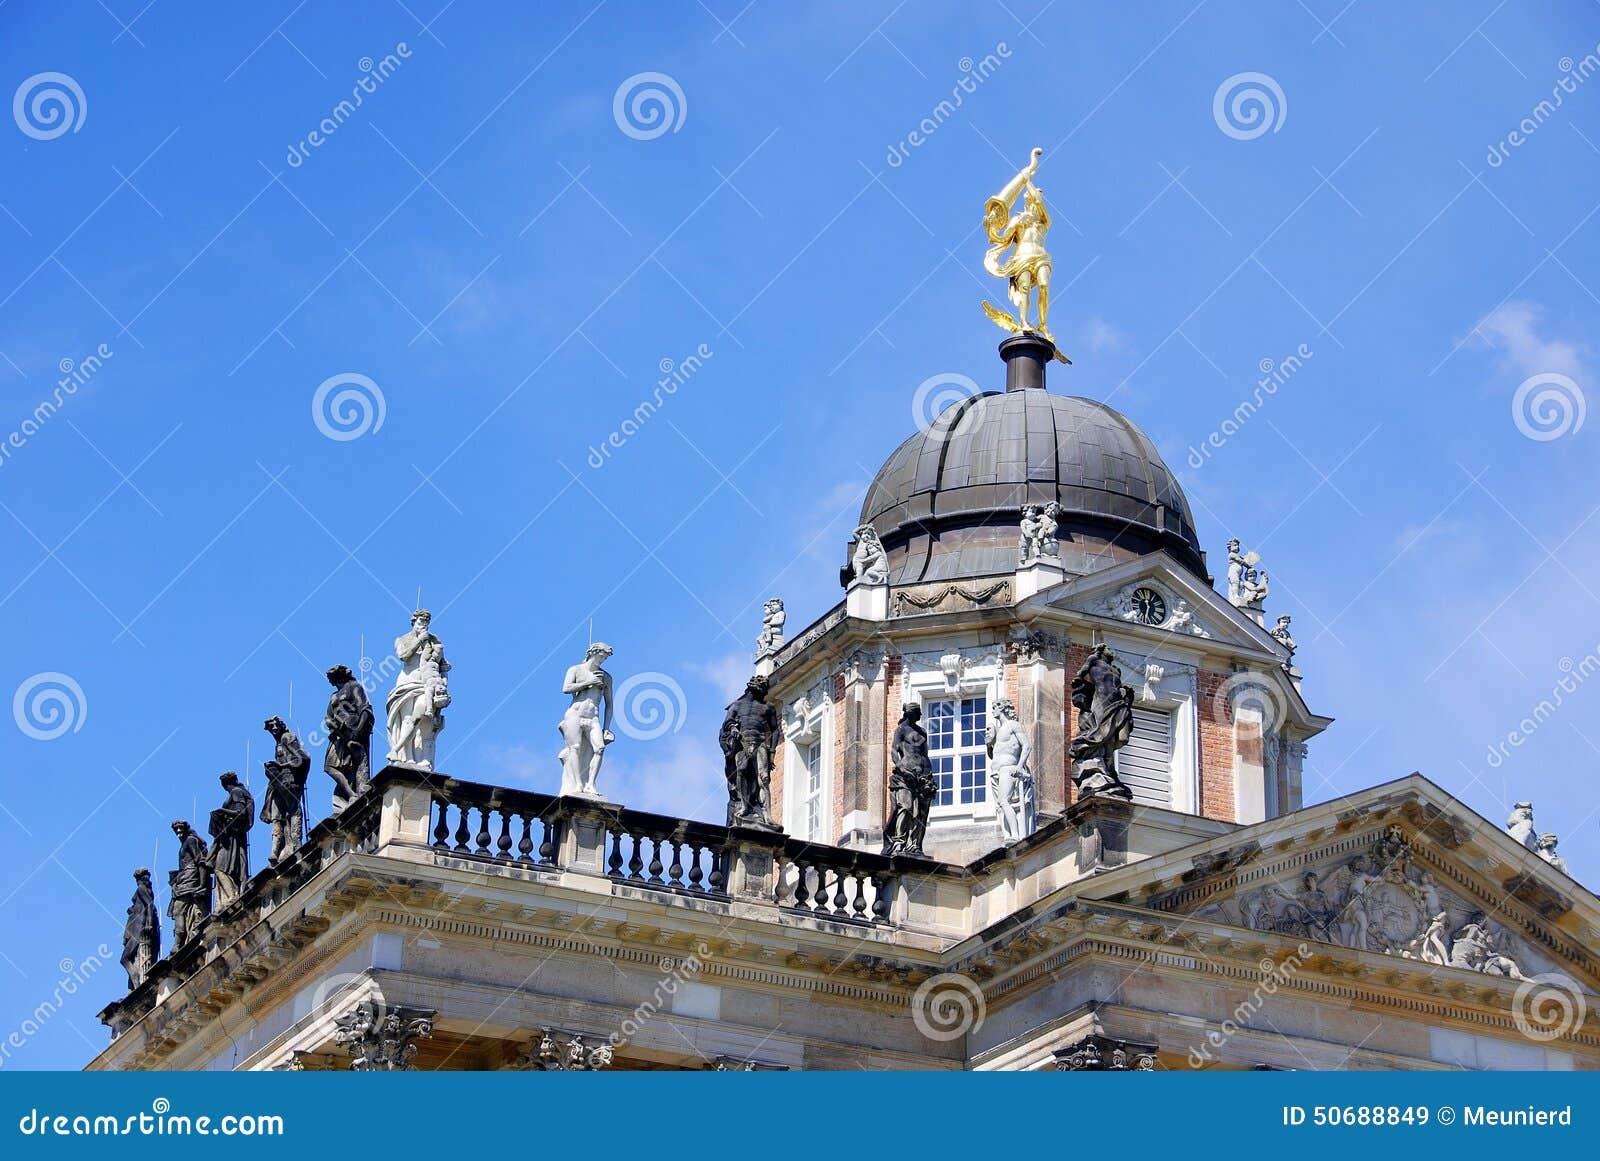 Download 宫殿在Sanssouci公园 库存图片. 图片 包括有 皇家, beautifuler, brandon - 50688849